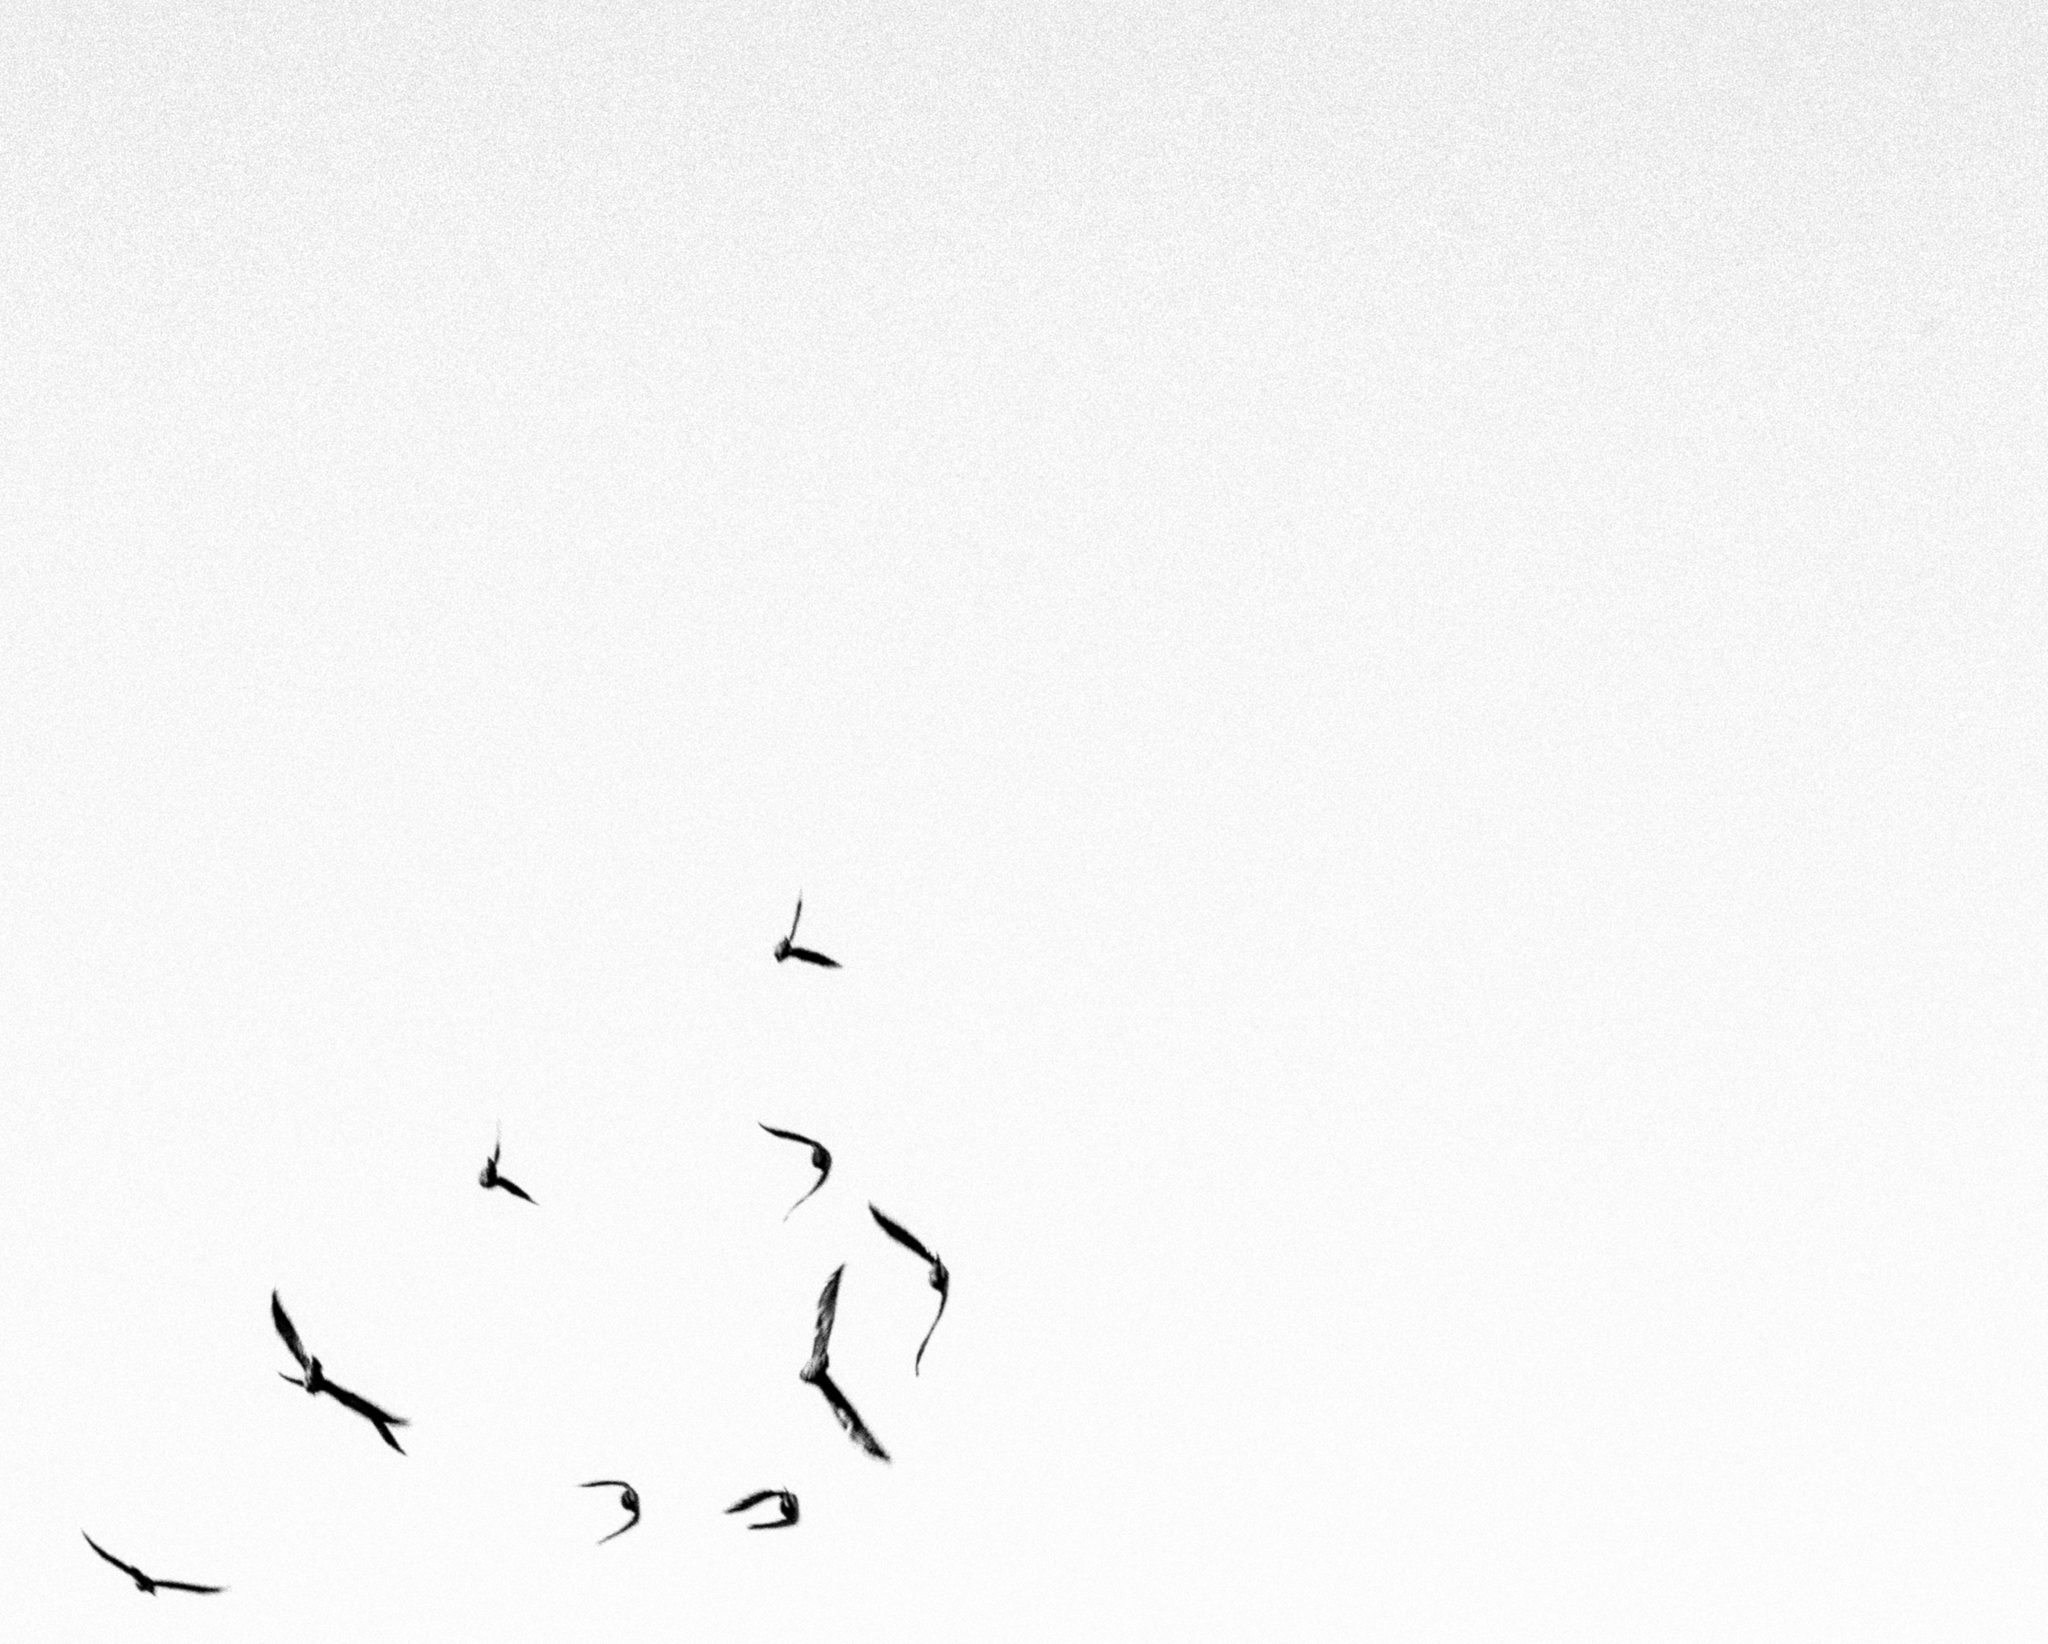 birds barcelona - blackandwhite - deanmcleod | ello